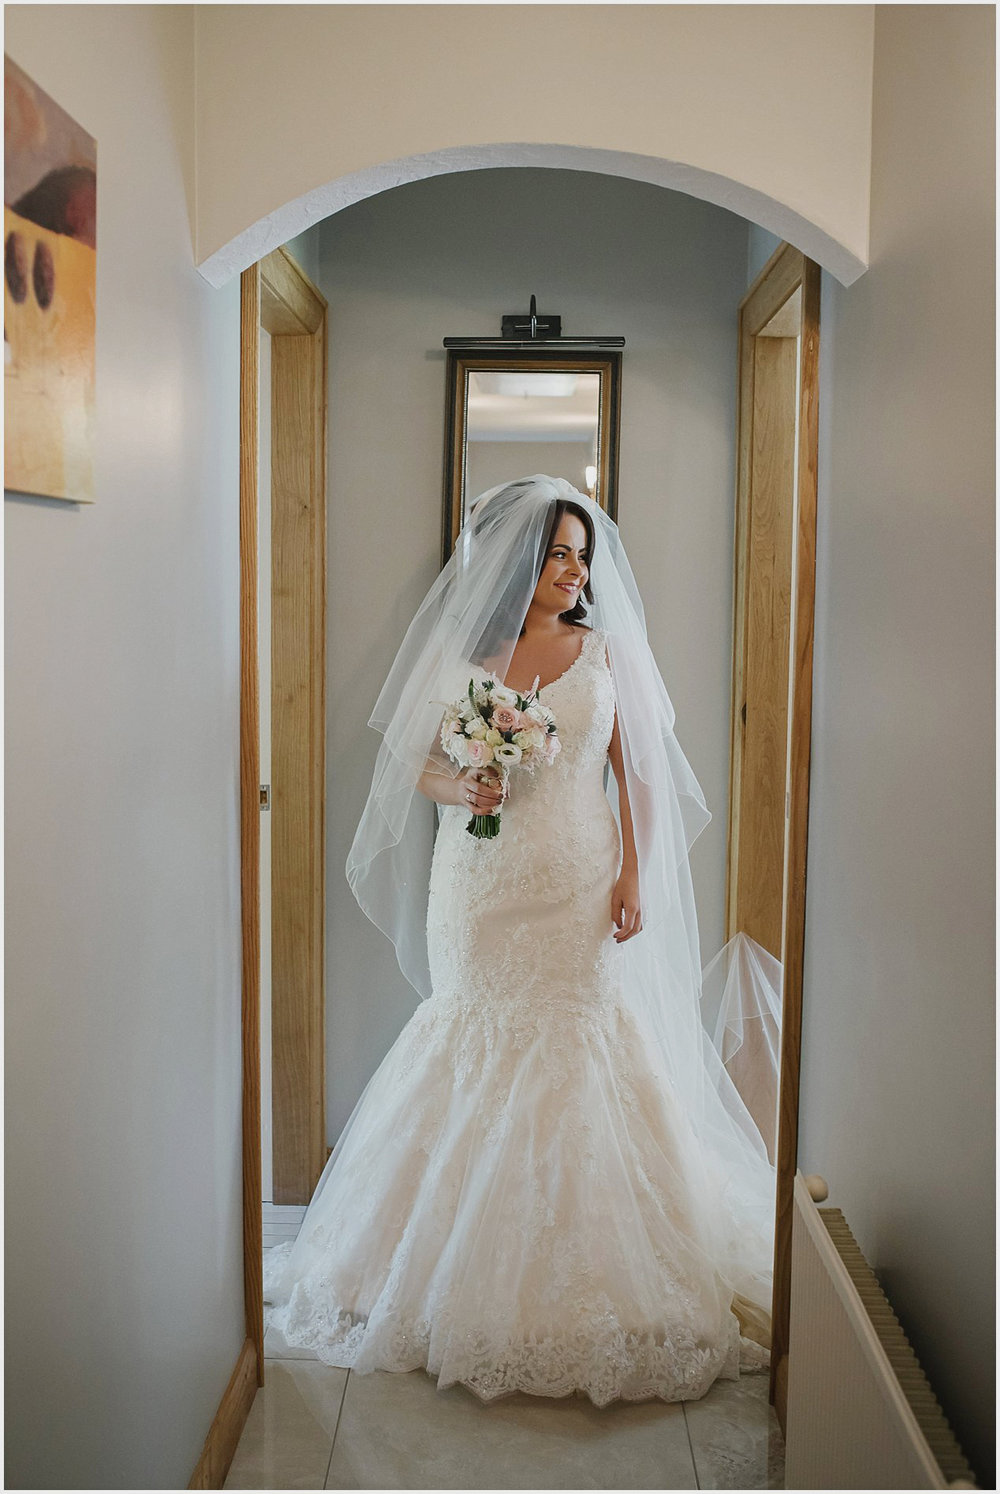 Shauneen_PJ_Hillgrove_Hotel_Monaghan_Wedding_jude_browne_photography_0015.jpg